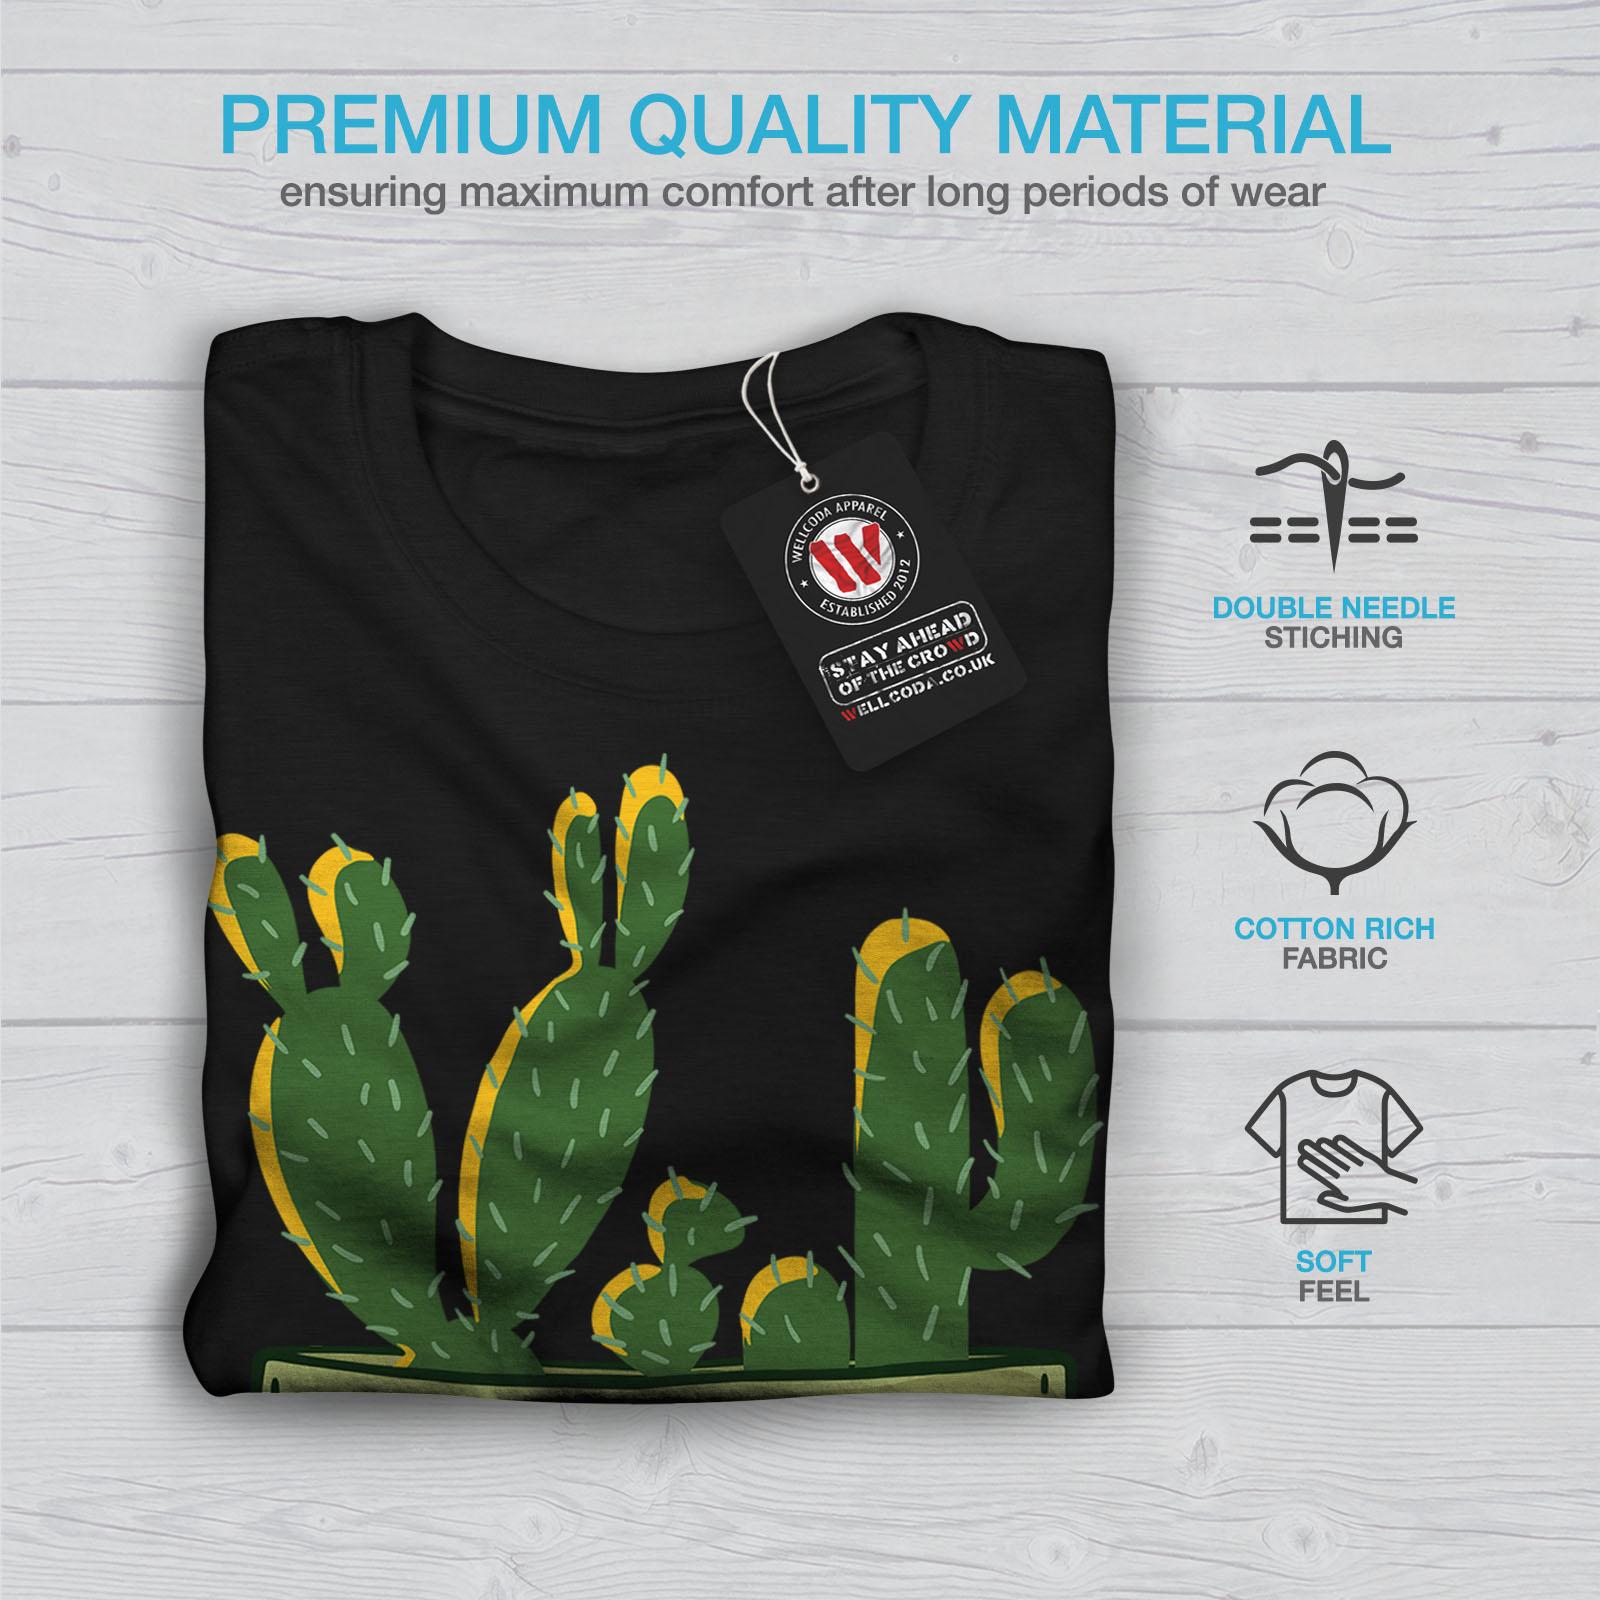 miniature 7 - Wellcoda Hug Me Cactus Funny Mens T-shirt,  Graphic Design Printed Tee